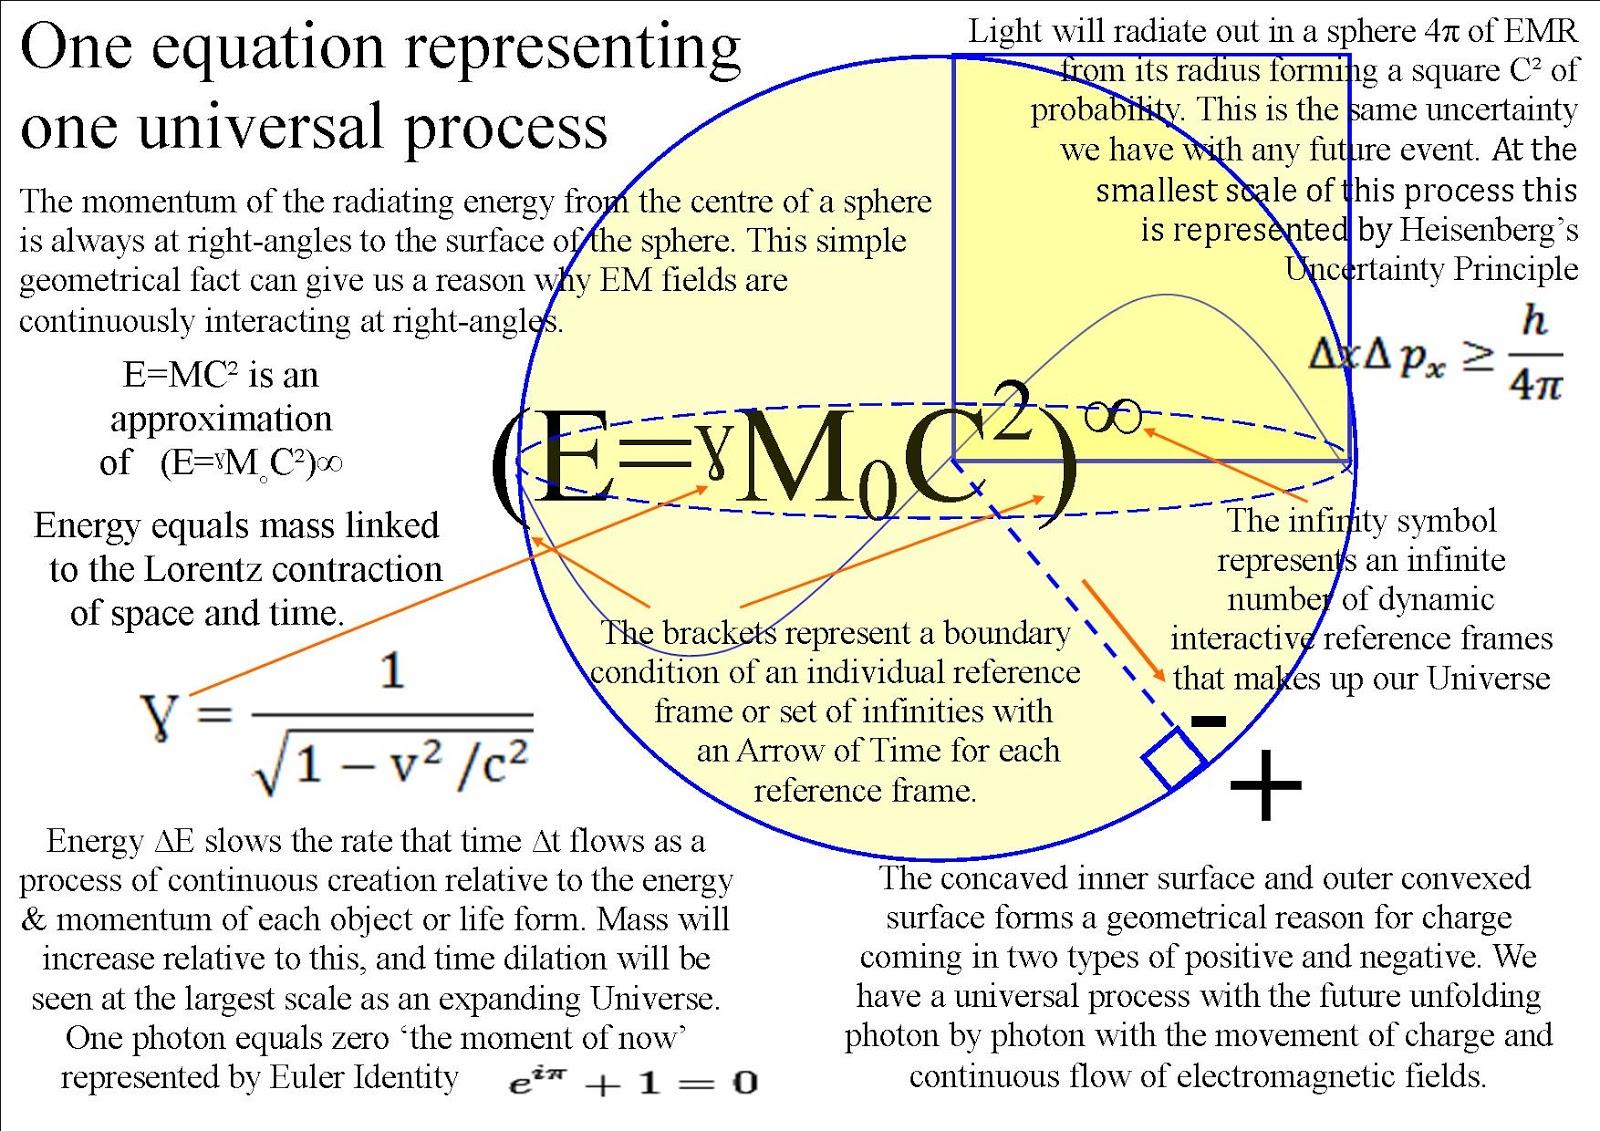 quantum art and poetry: One equation (E=ˠM˳C²)∞ one universal ...